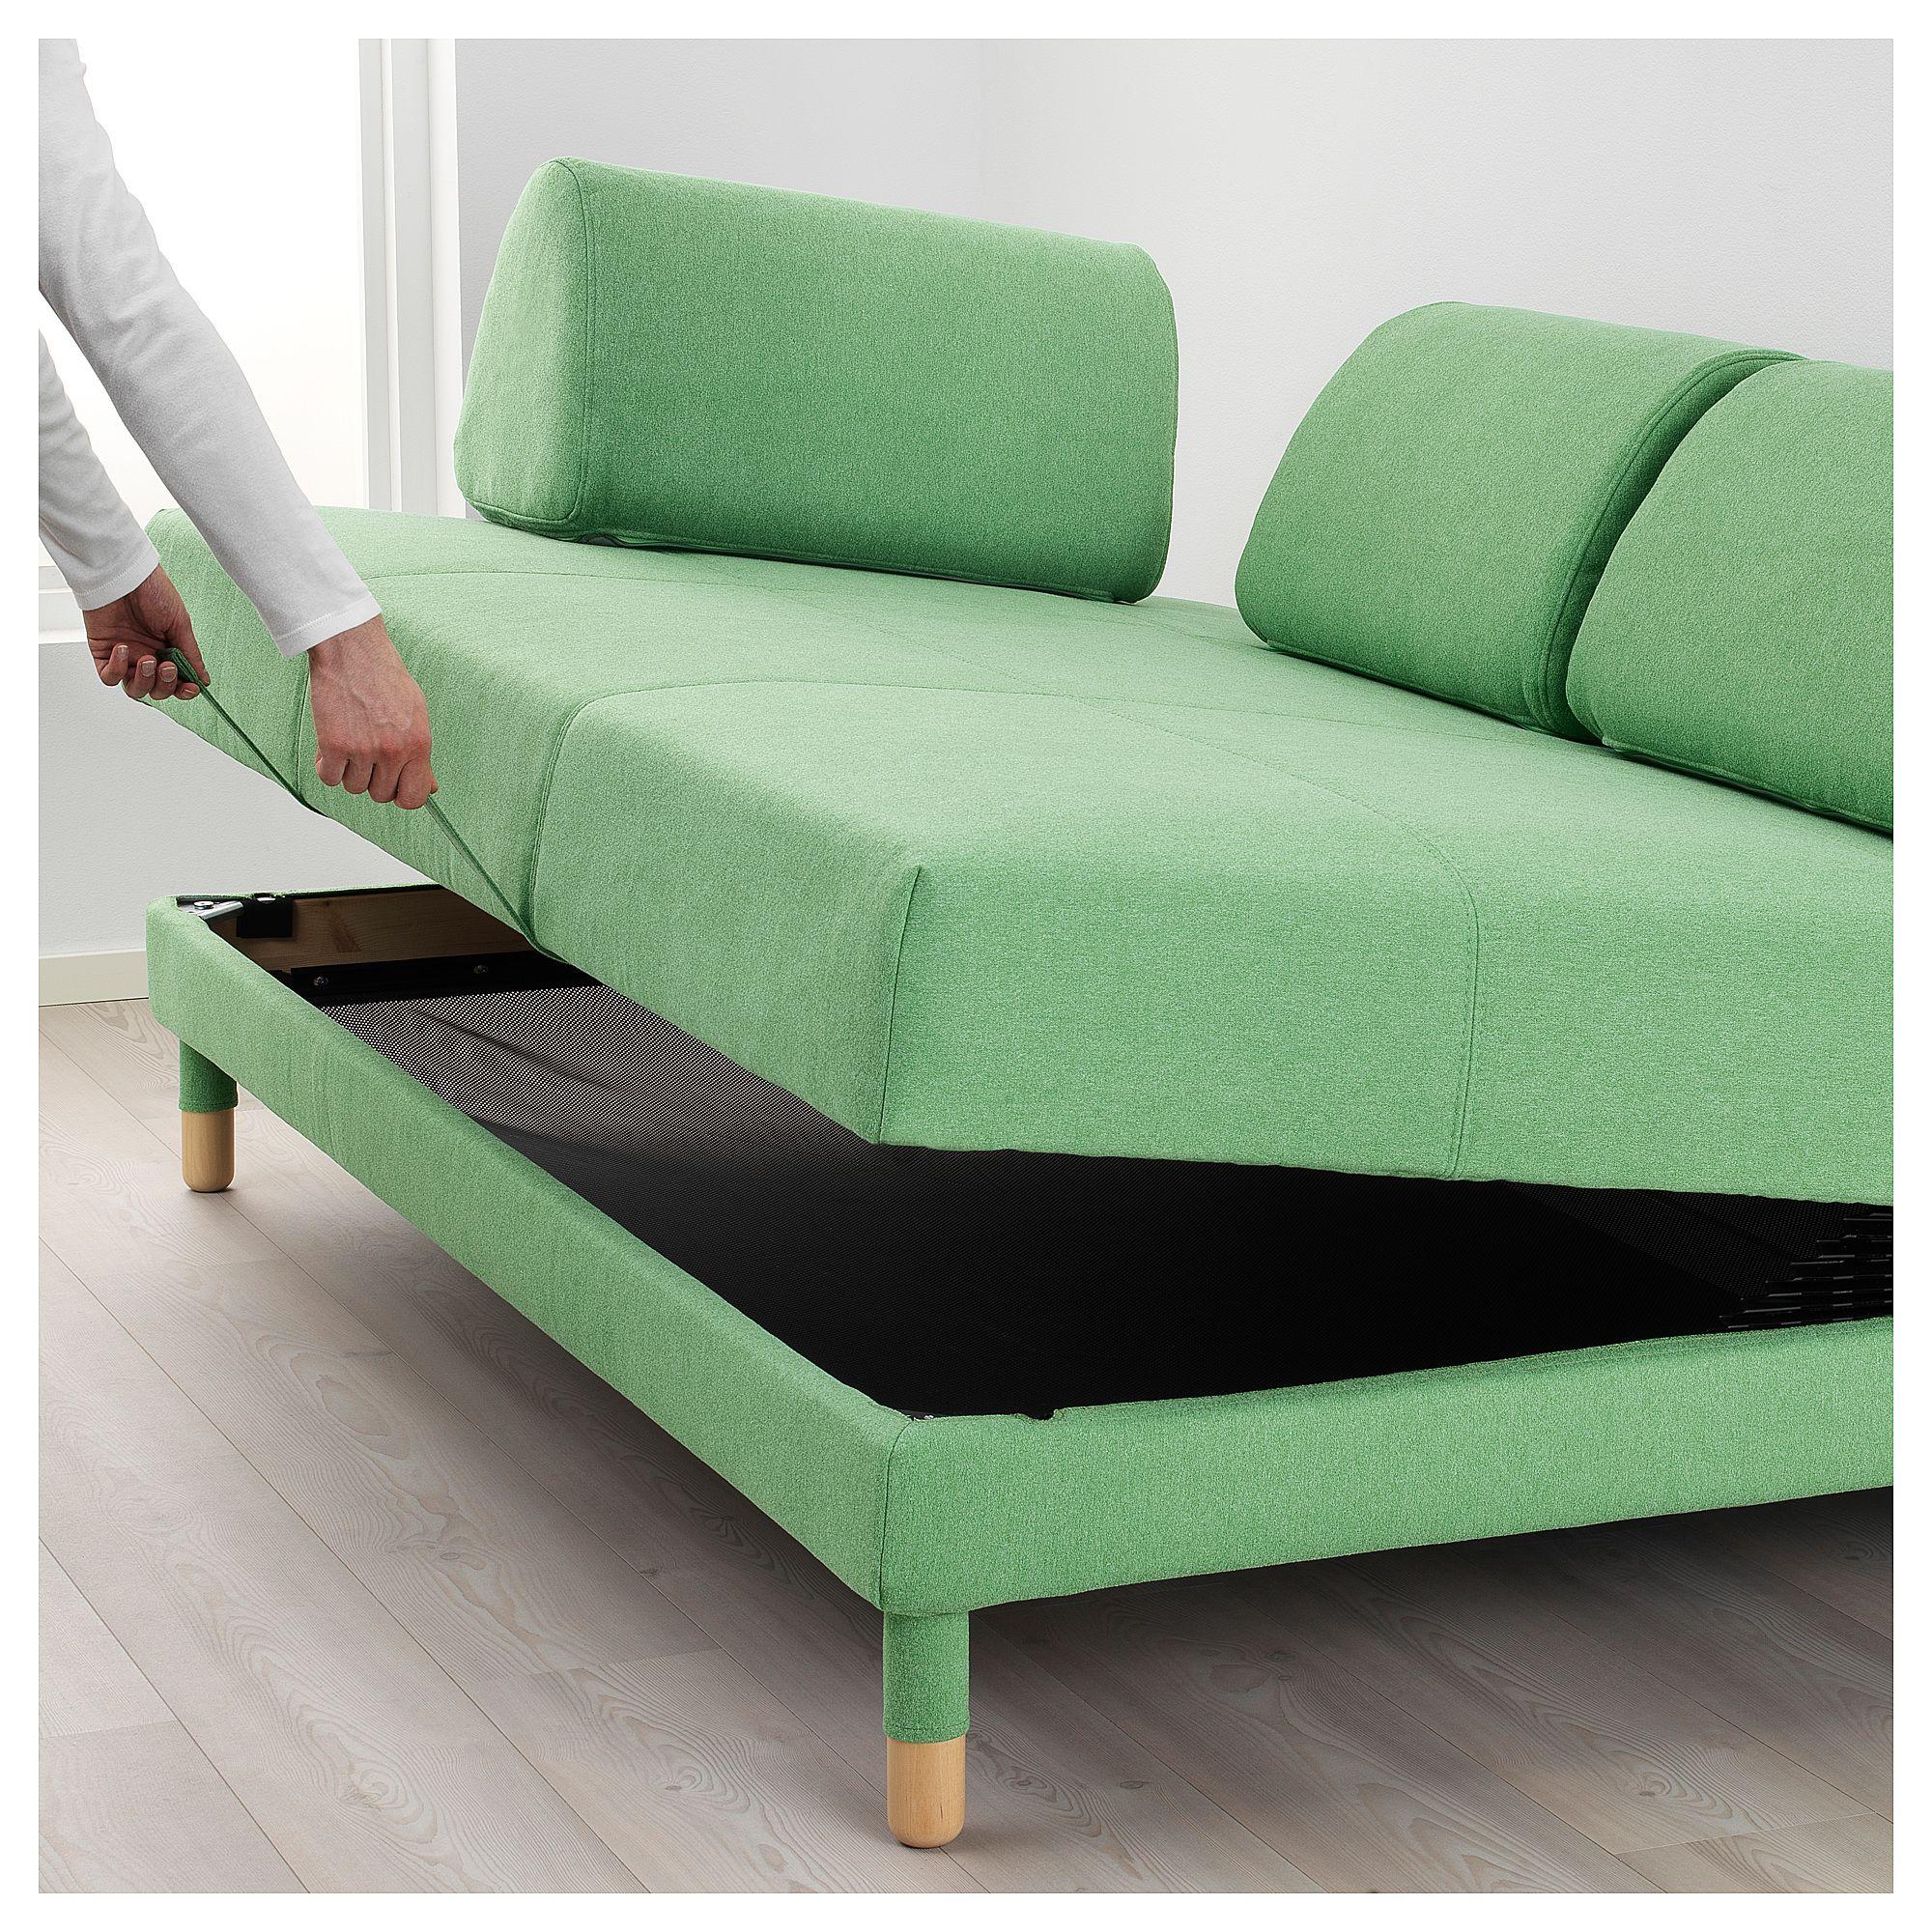 Furniture And Home Furnishings Sleeper Sofa Ikea Sofa Storage